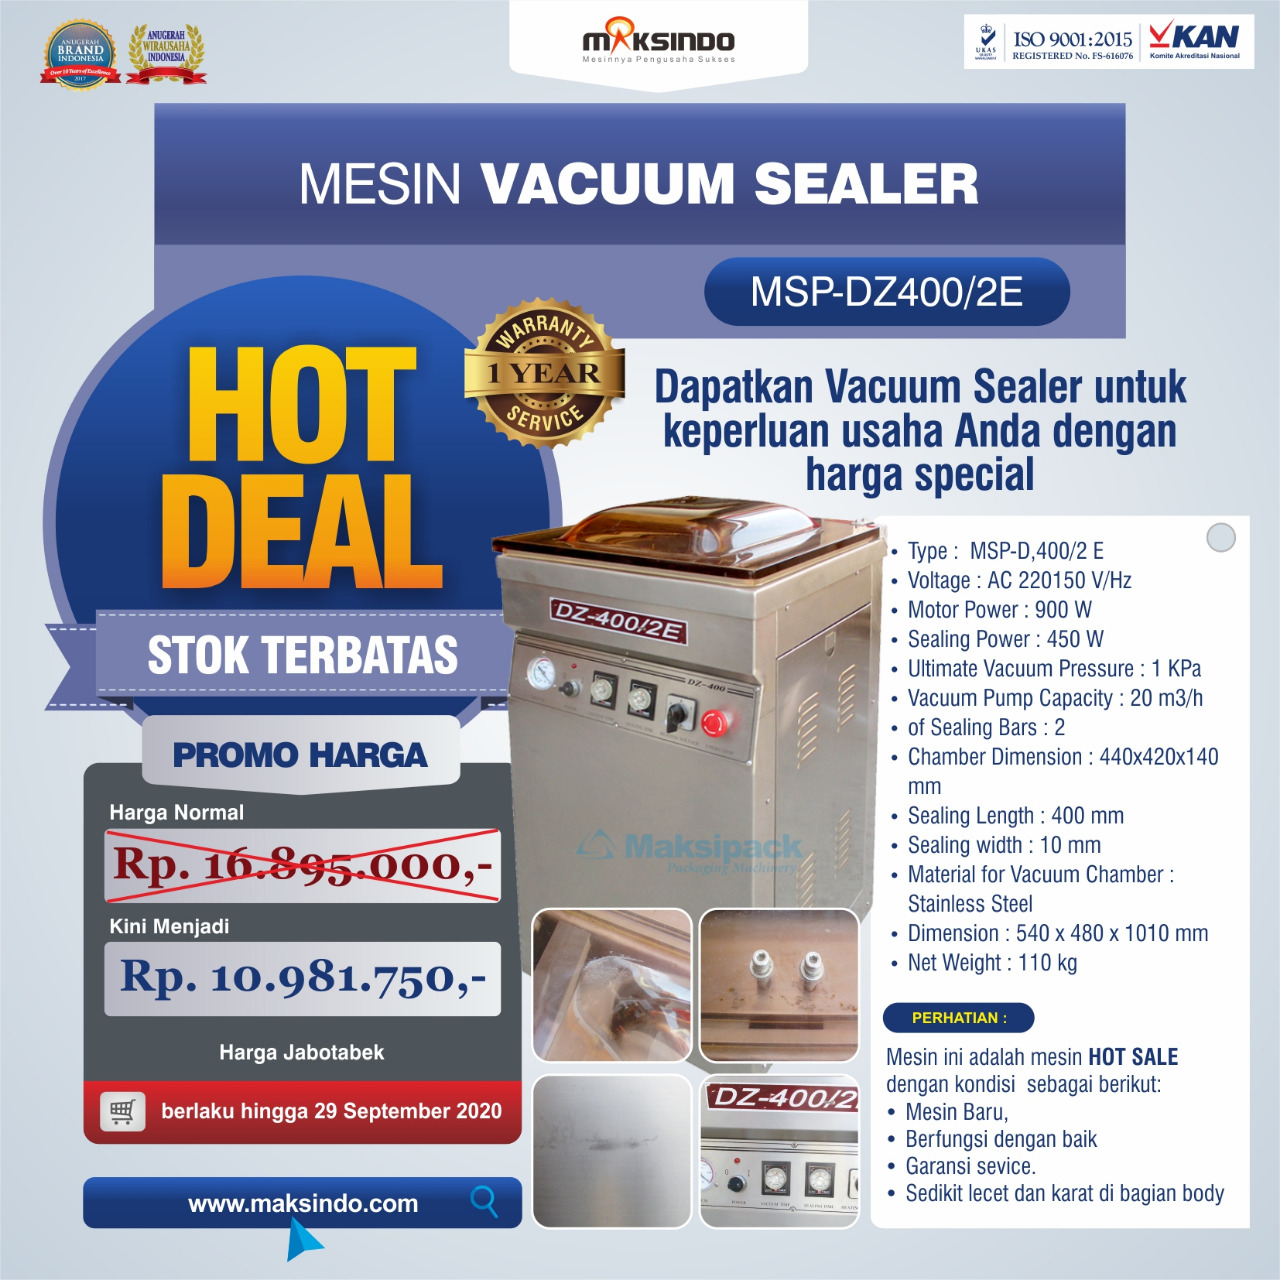 Mesin Vacuum Sealer Type MSP-DZ400/2 E